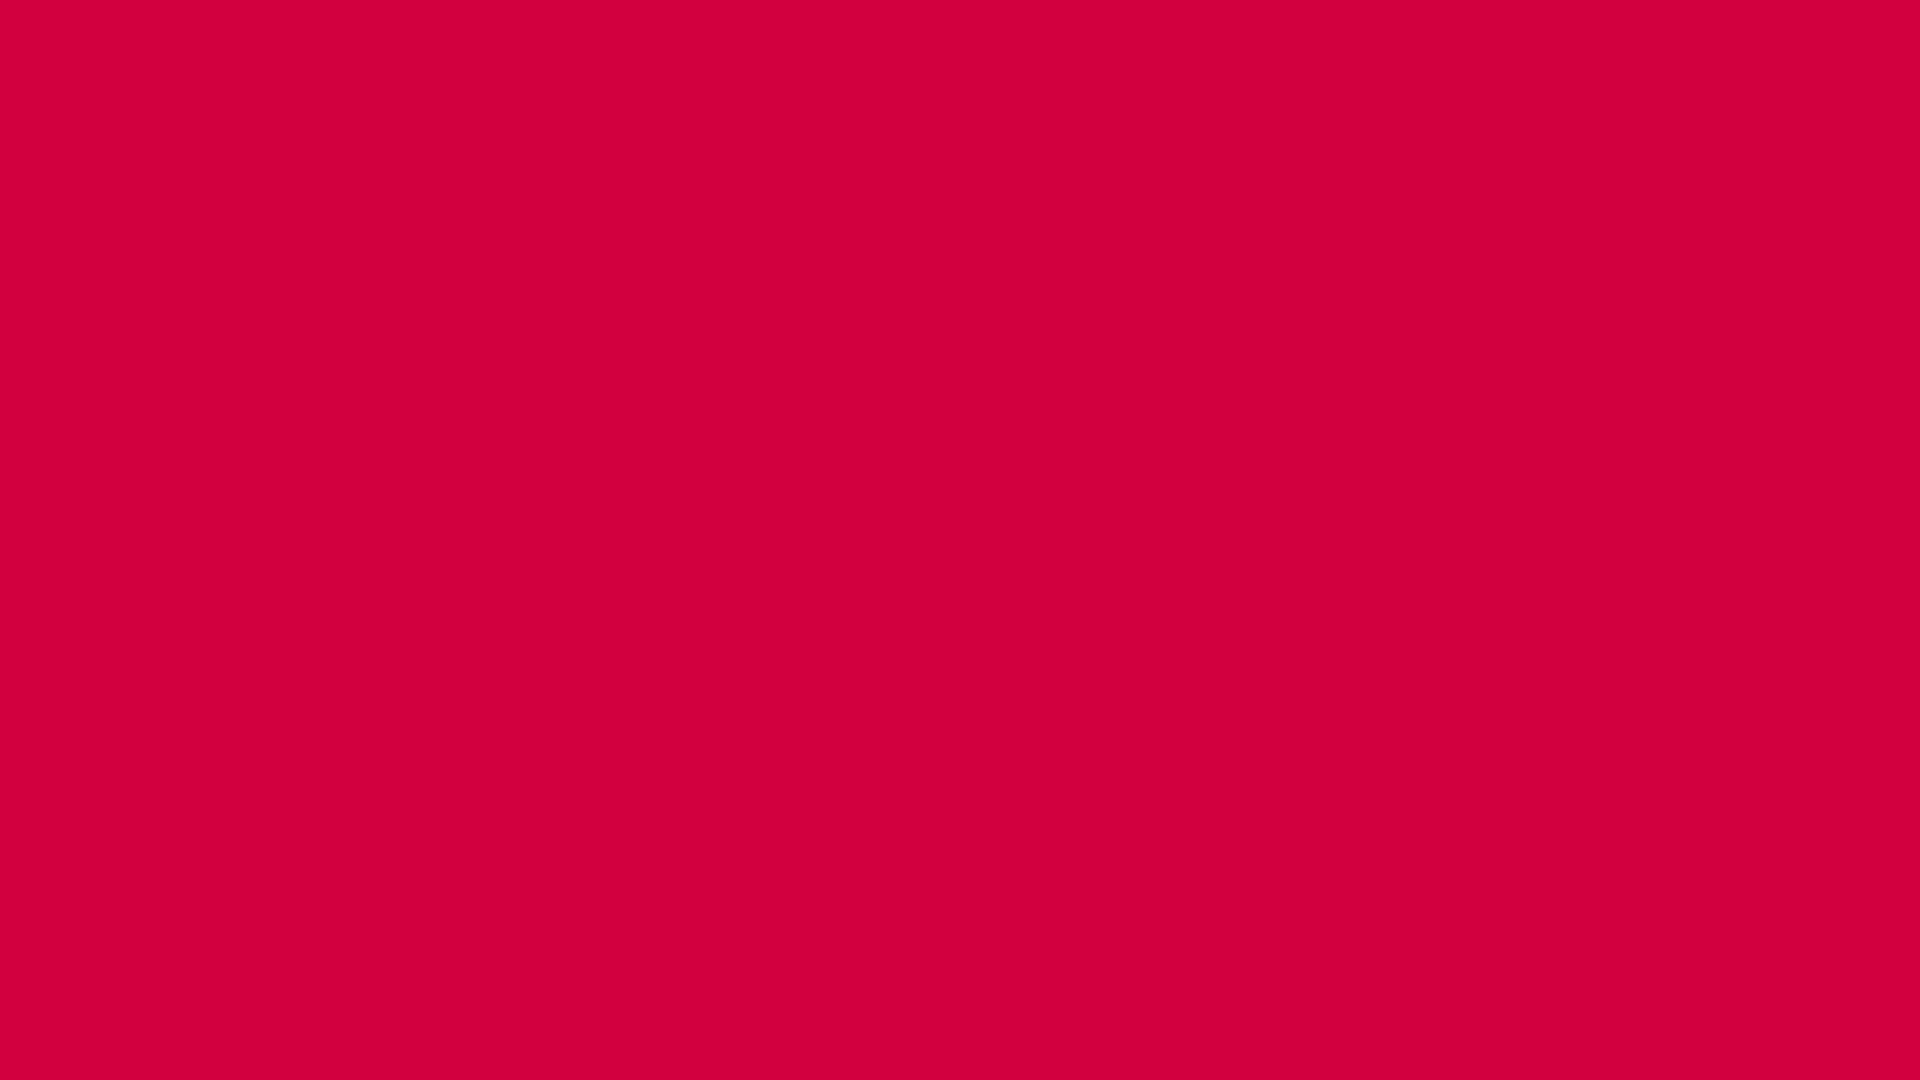 1920x1080 Utah Crimson Solid Color Background